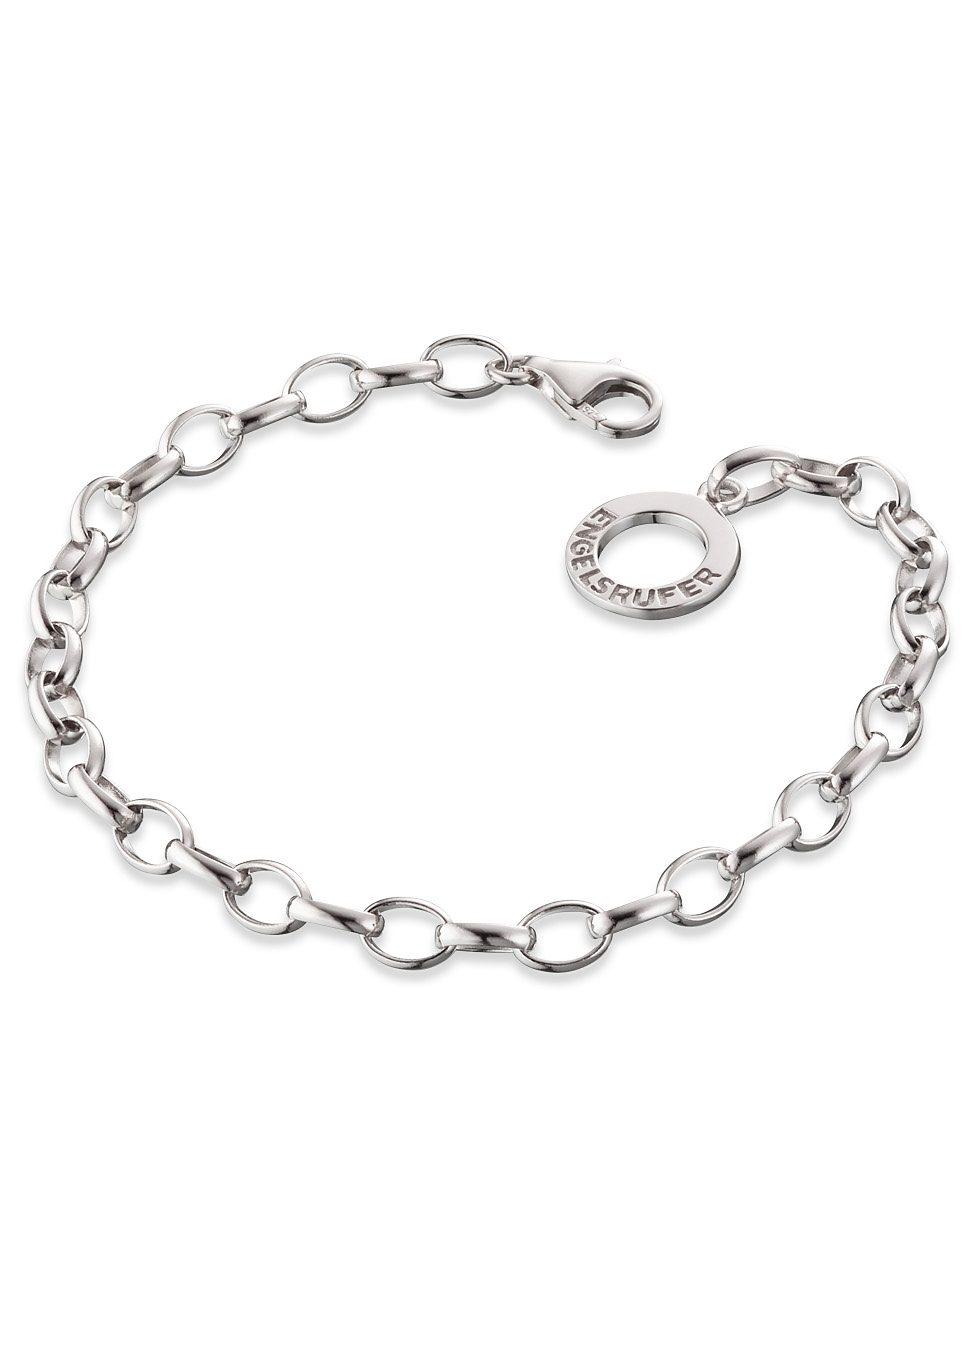 Engelsrufer Charm-Armband »ARMBAND SILBER 19,5CM, ERB-195« | Schmuck > Armbänder > Charm-Armbänder | Engelsrufer